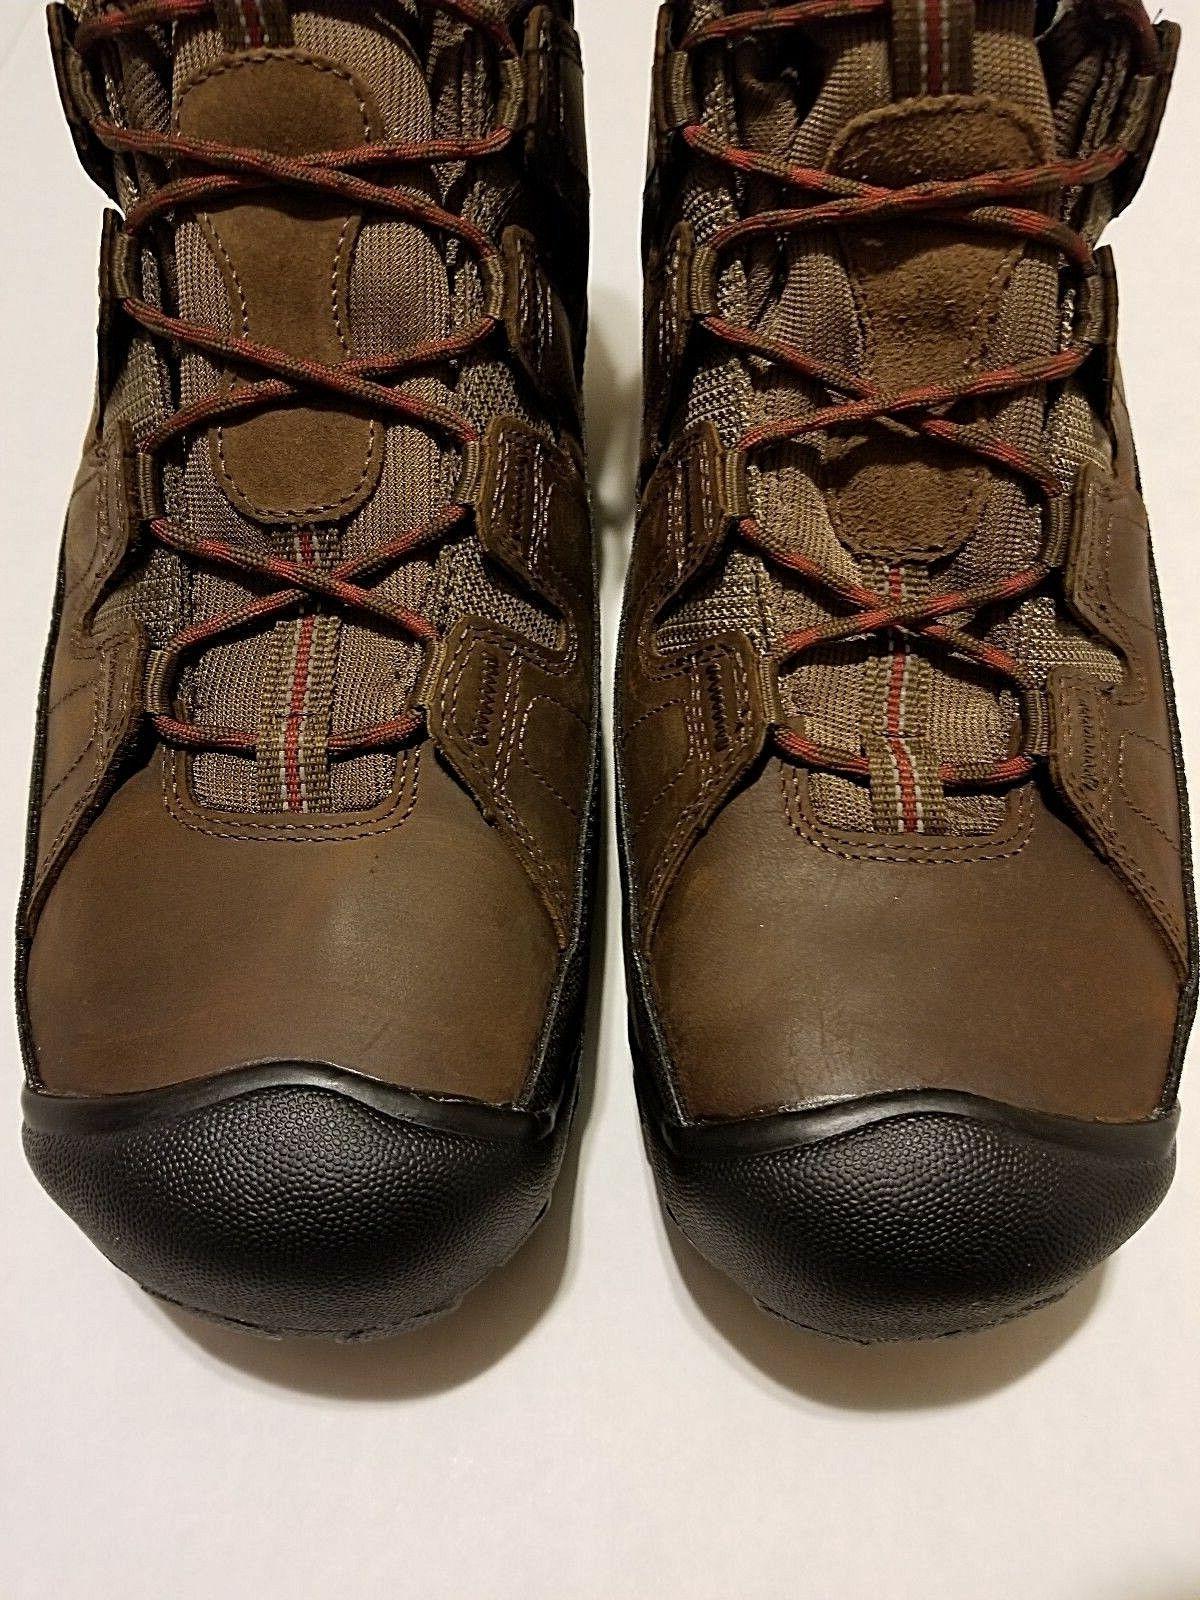 KEEN 1013256 STEEL TOE Utility 600G Brown Work Boots